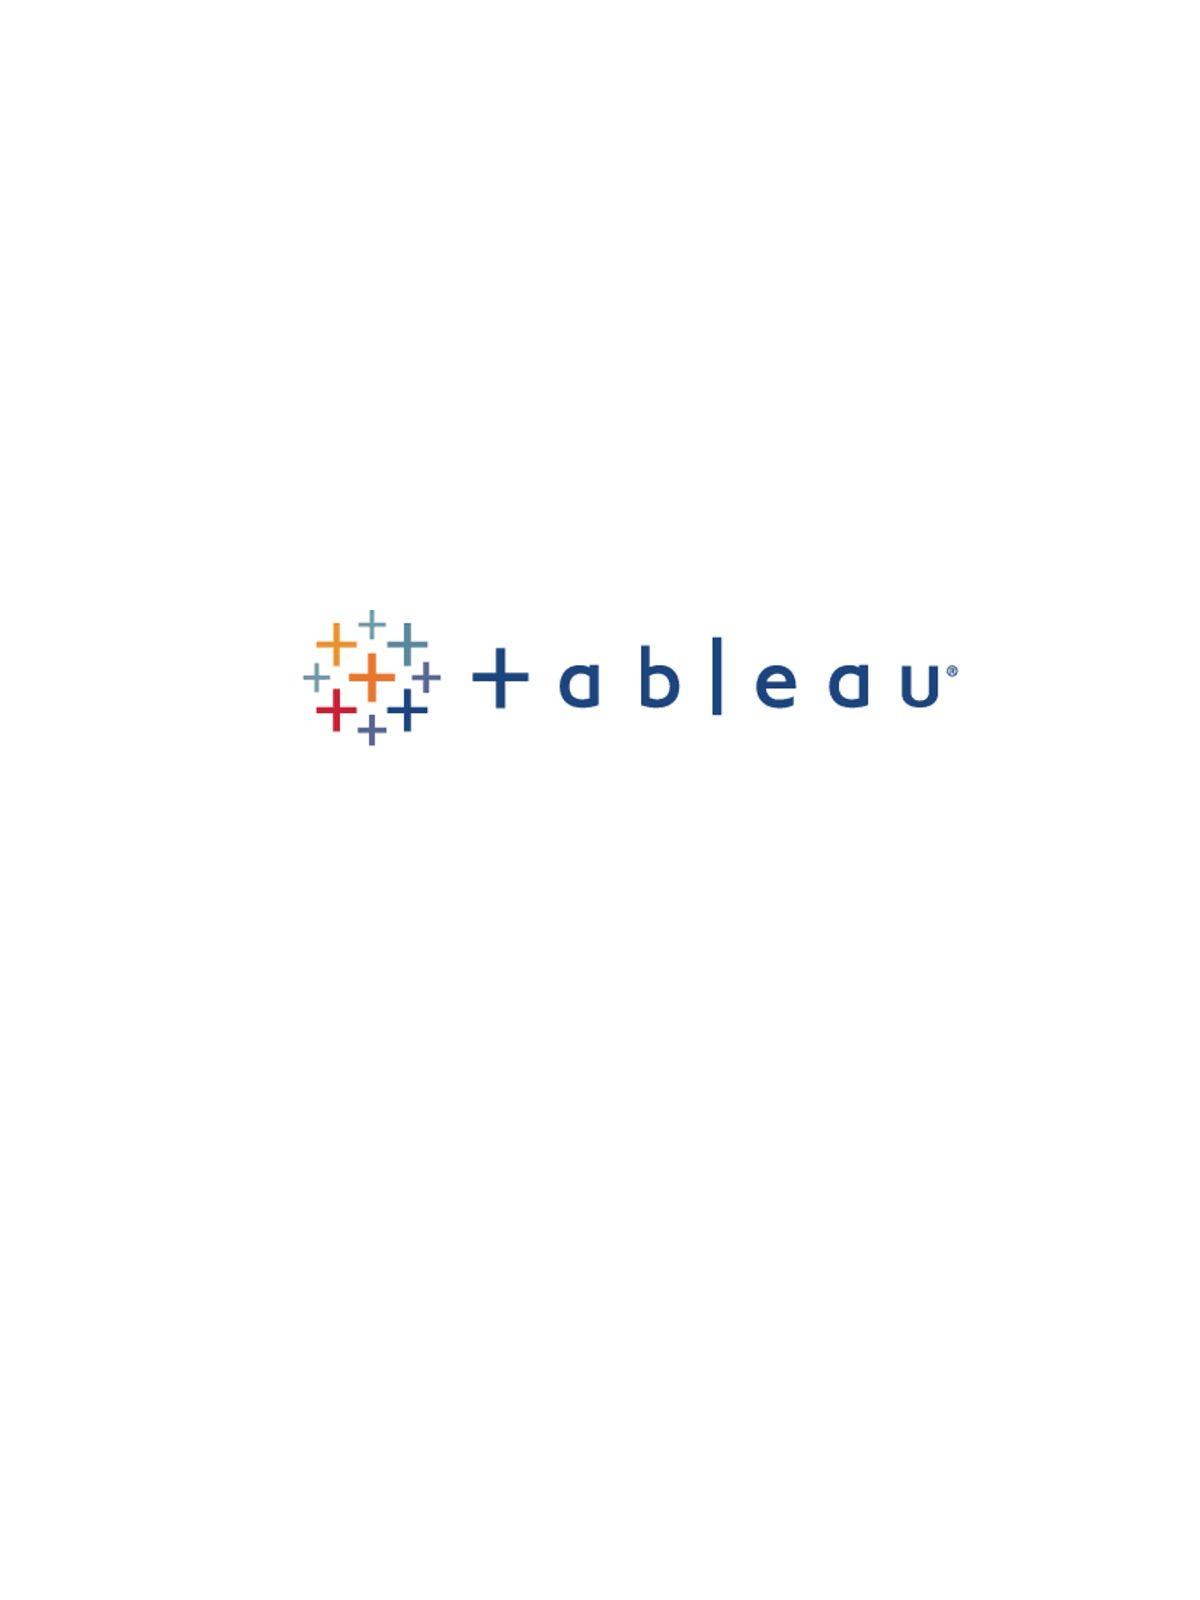 16 Hours Only Tableau BI Training Course in Edinburgh, 2 February | Event in Edinburgh | AllEvents.in